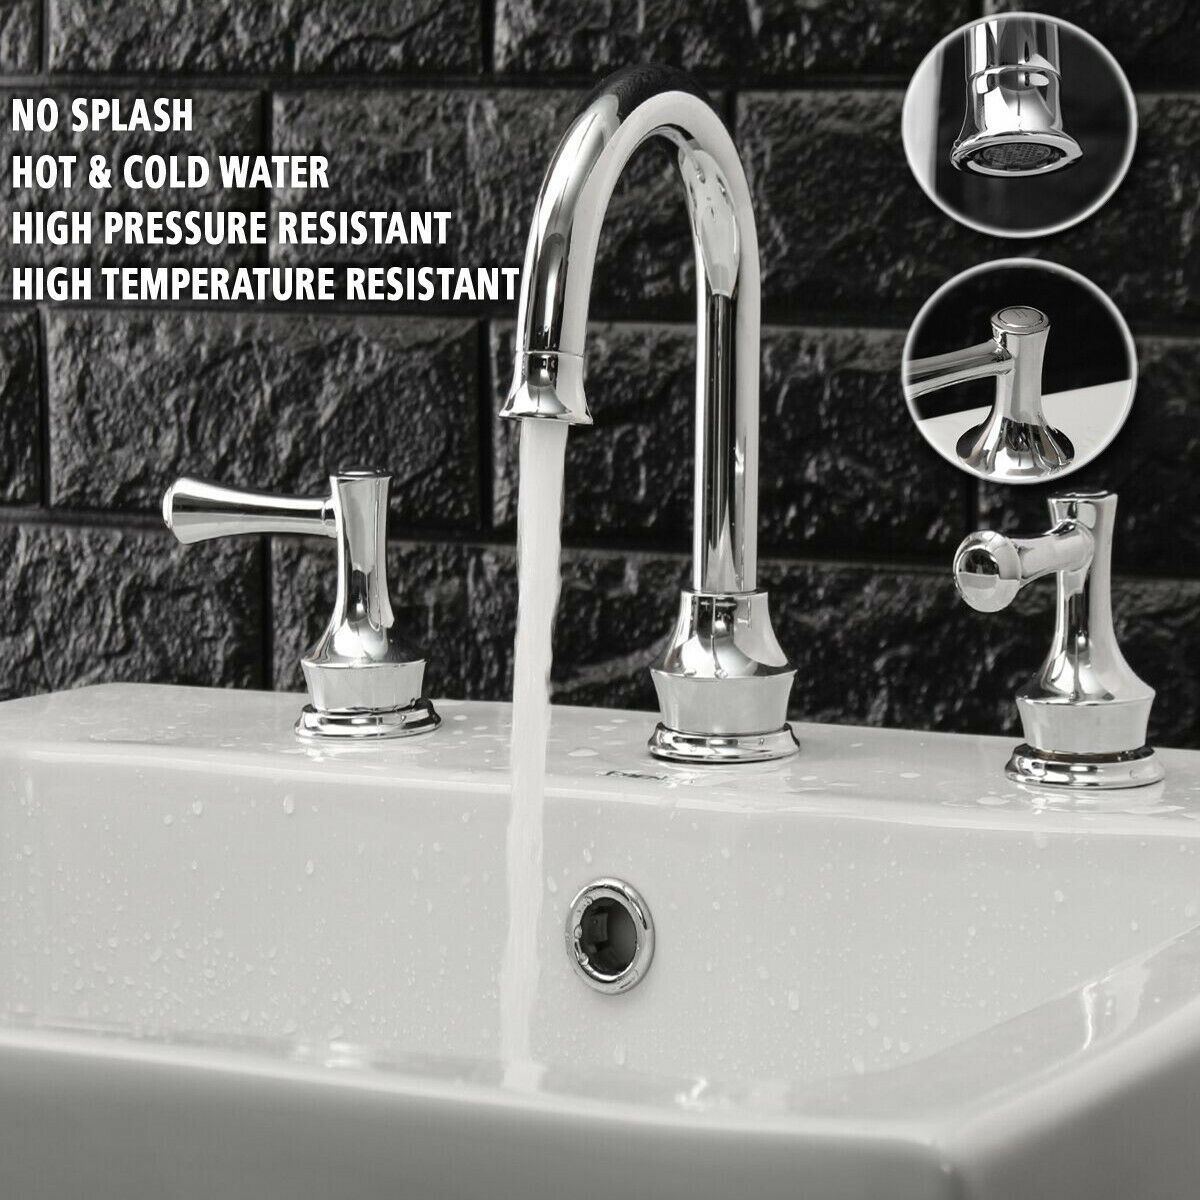 Tapcet 8 Widespread 2 Handles 3 Holes Bathroom Sink Faucet Chrome